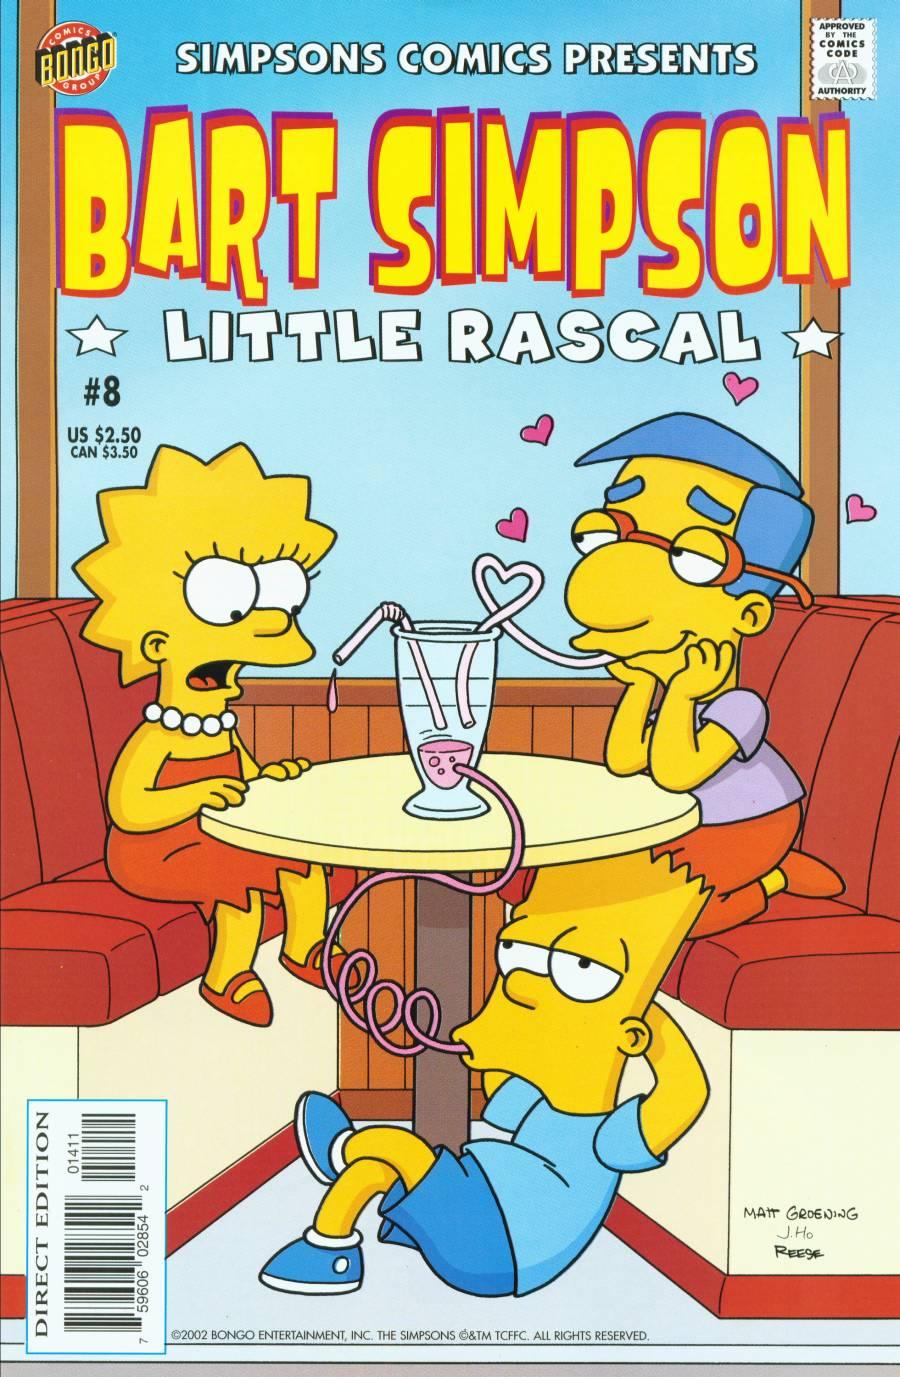 Simpsons Comics Presents Bart Simpson 8 Page 1